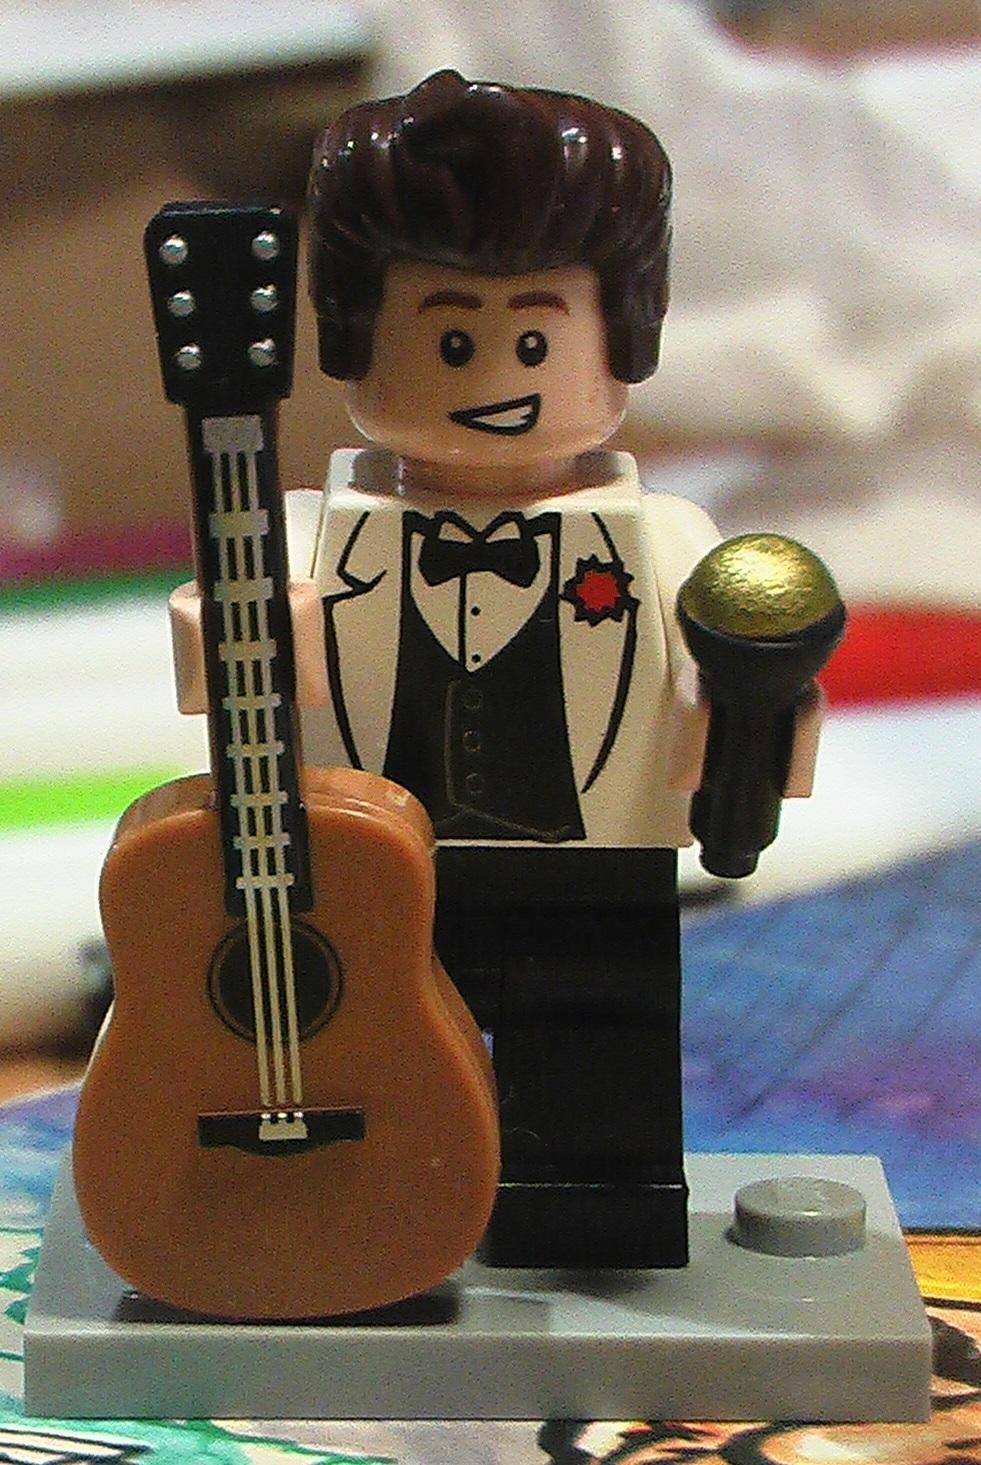 LEGO Cliff Richard by CCB-18